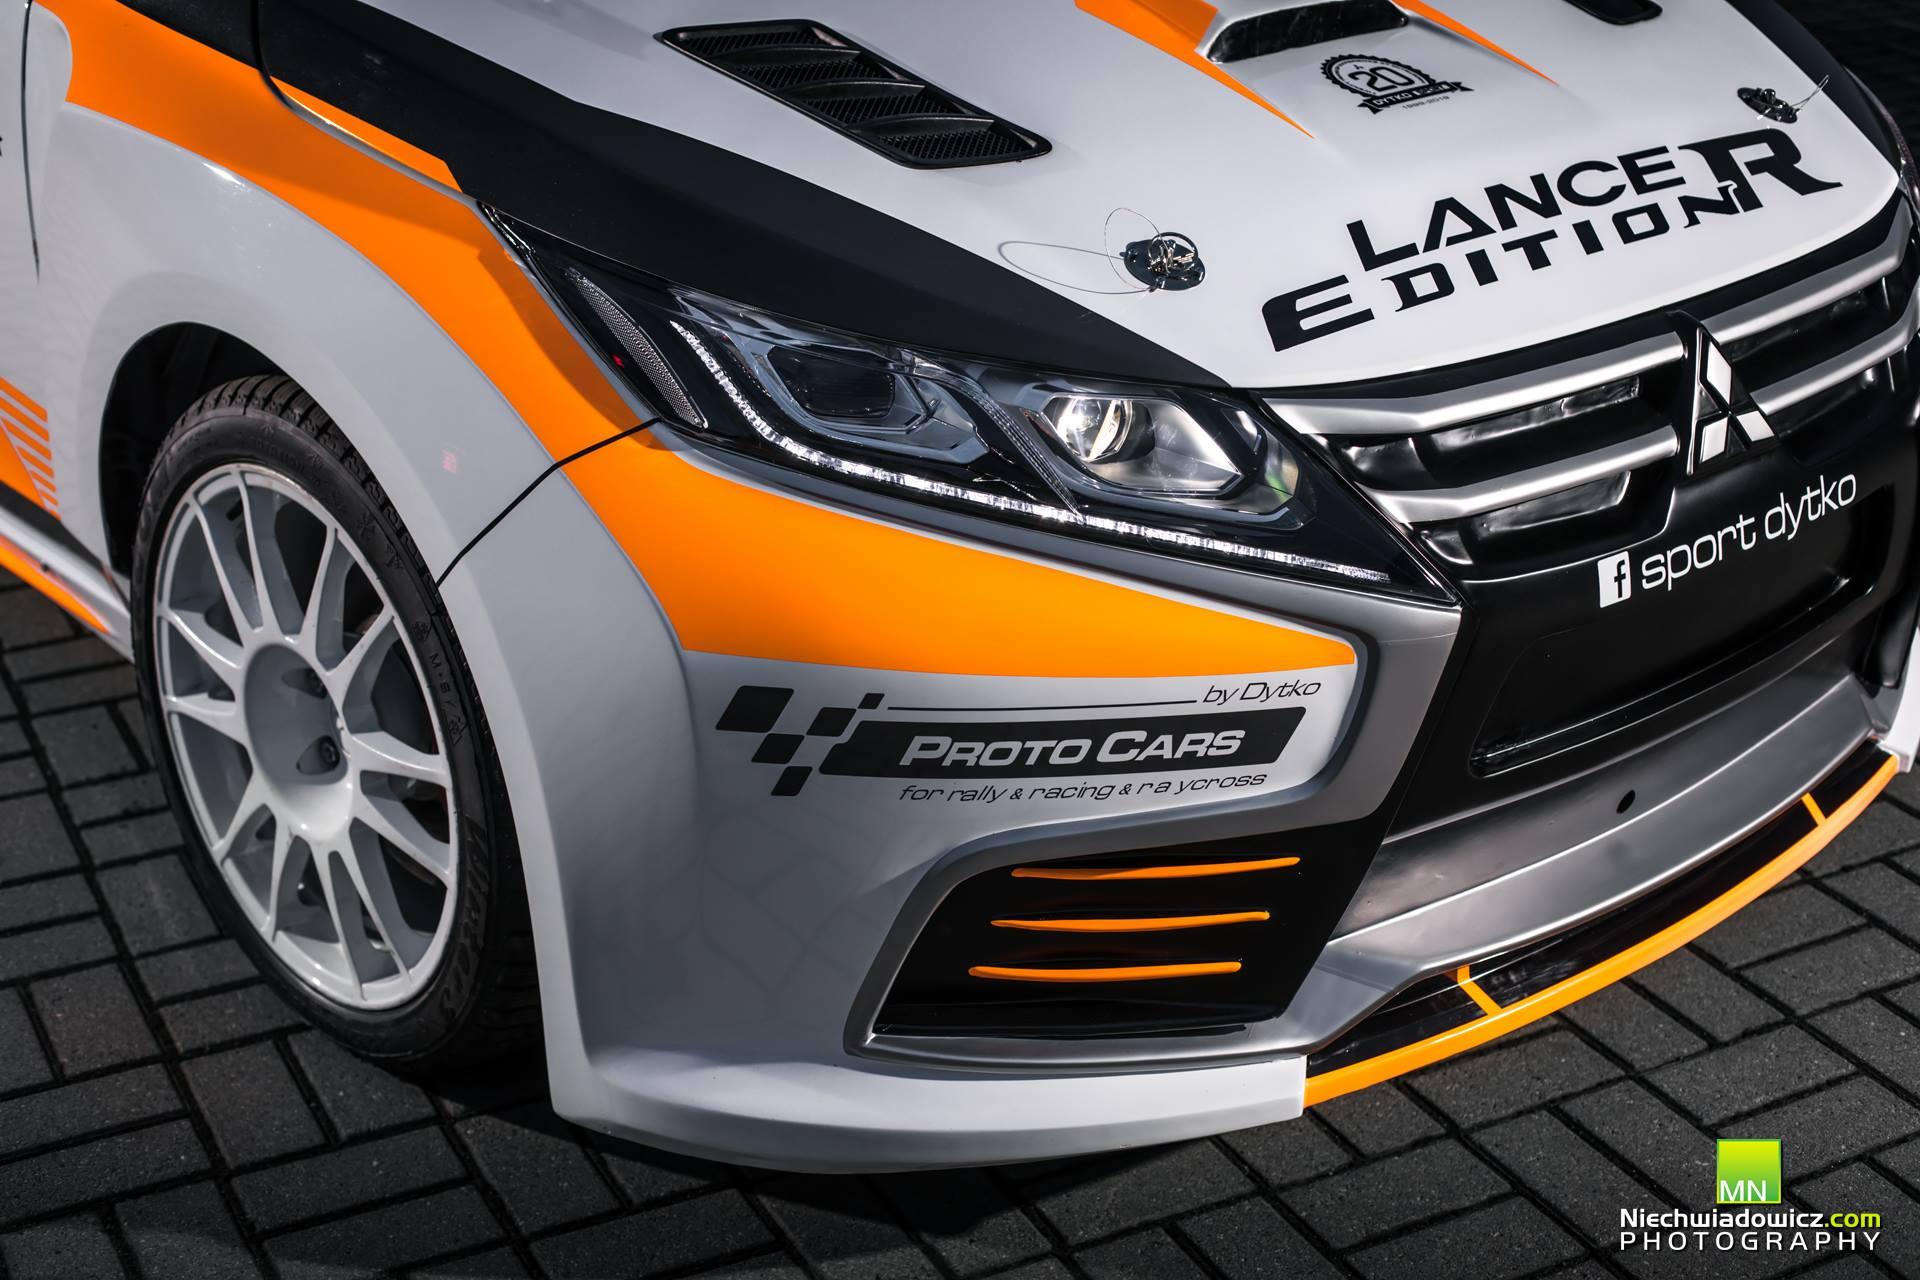 Mitsubishi_Lancer_Edition_R_by_Dytko_Sport_0006